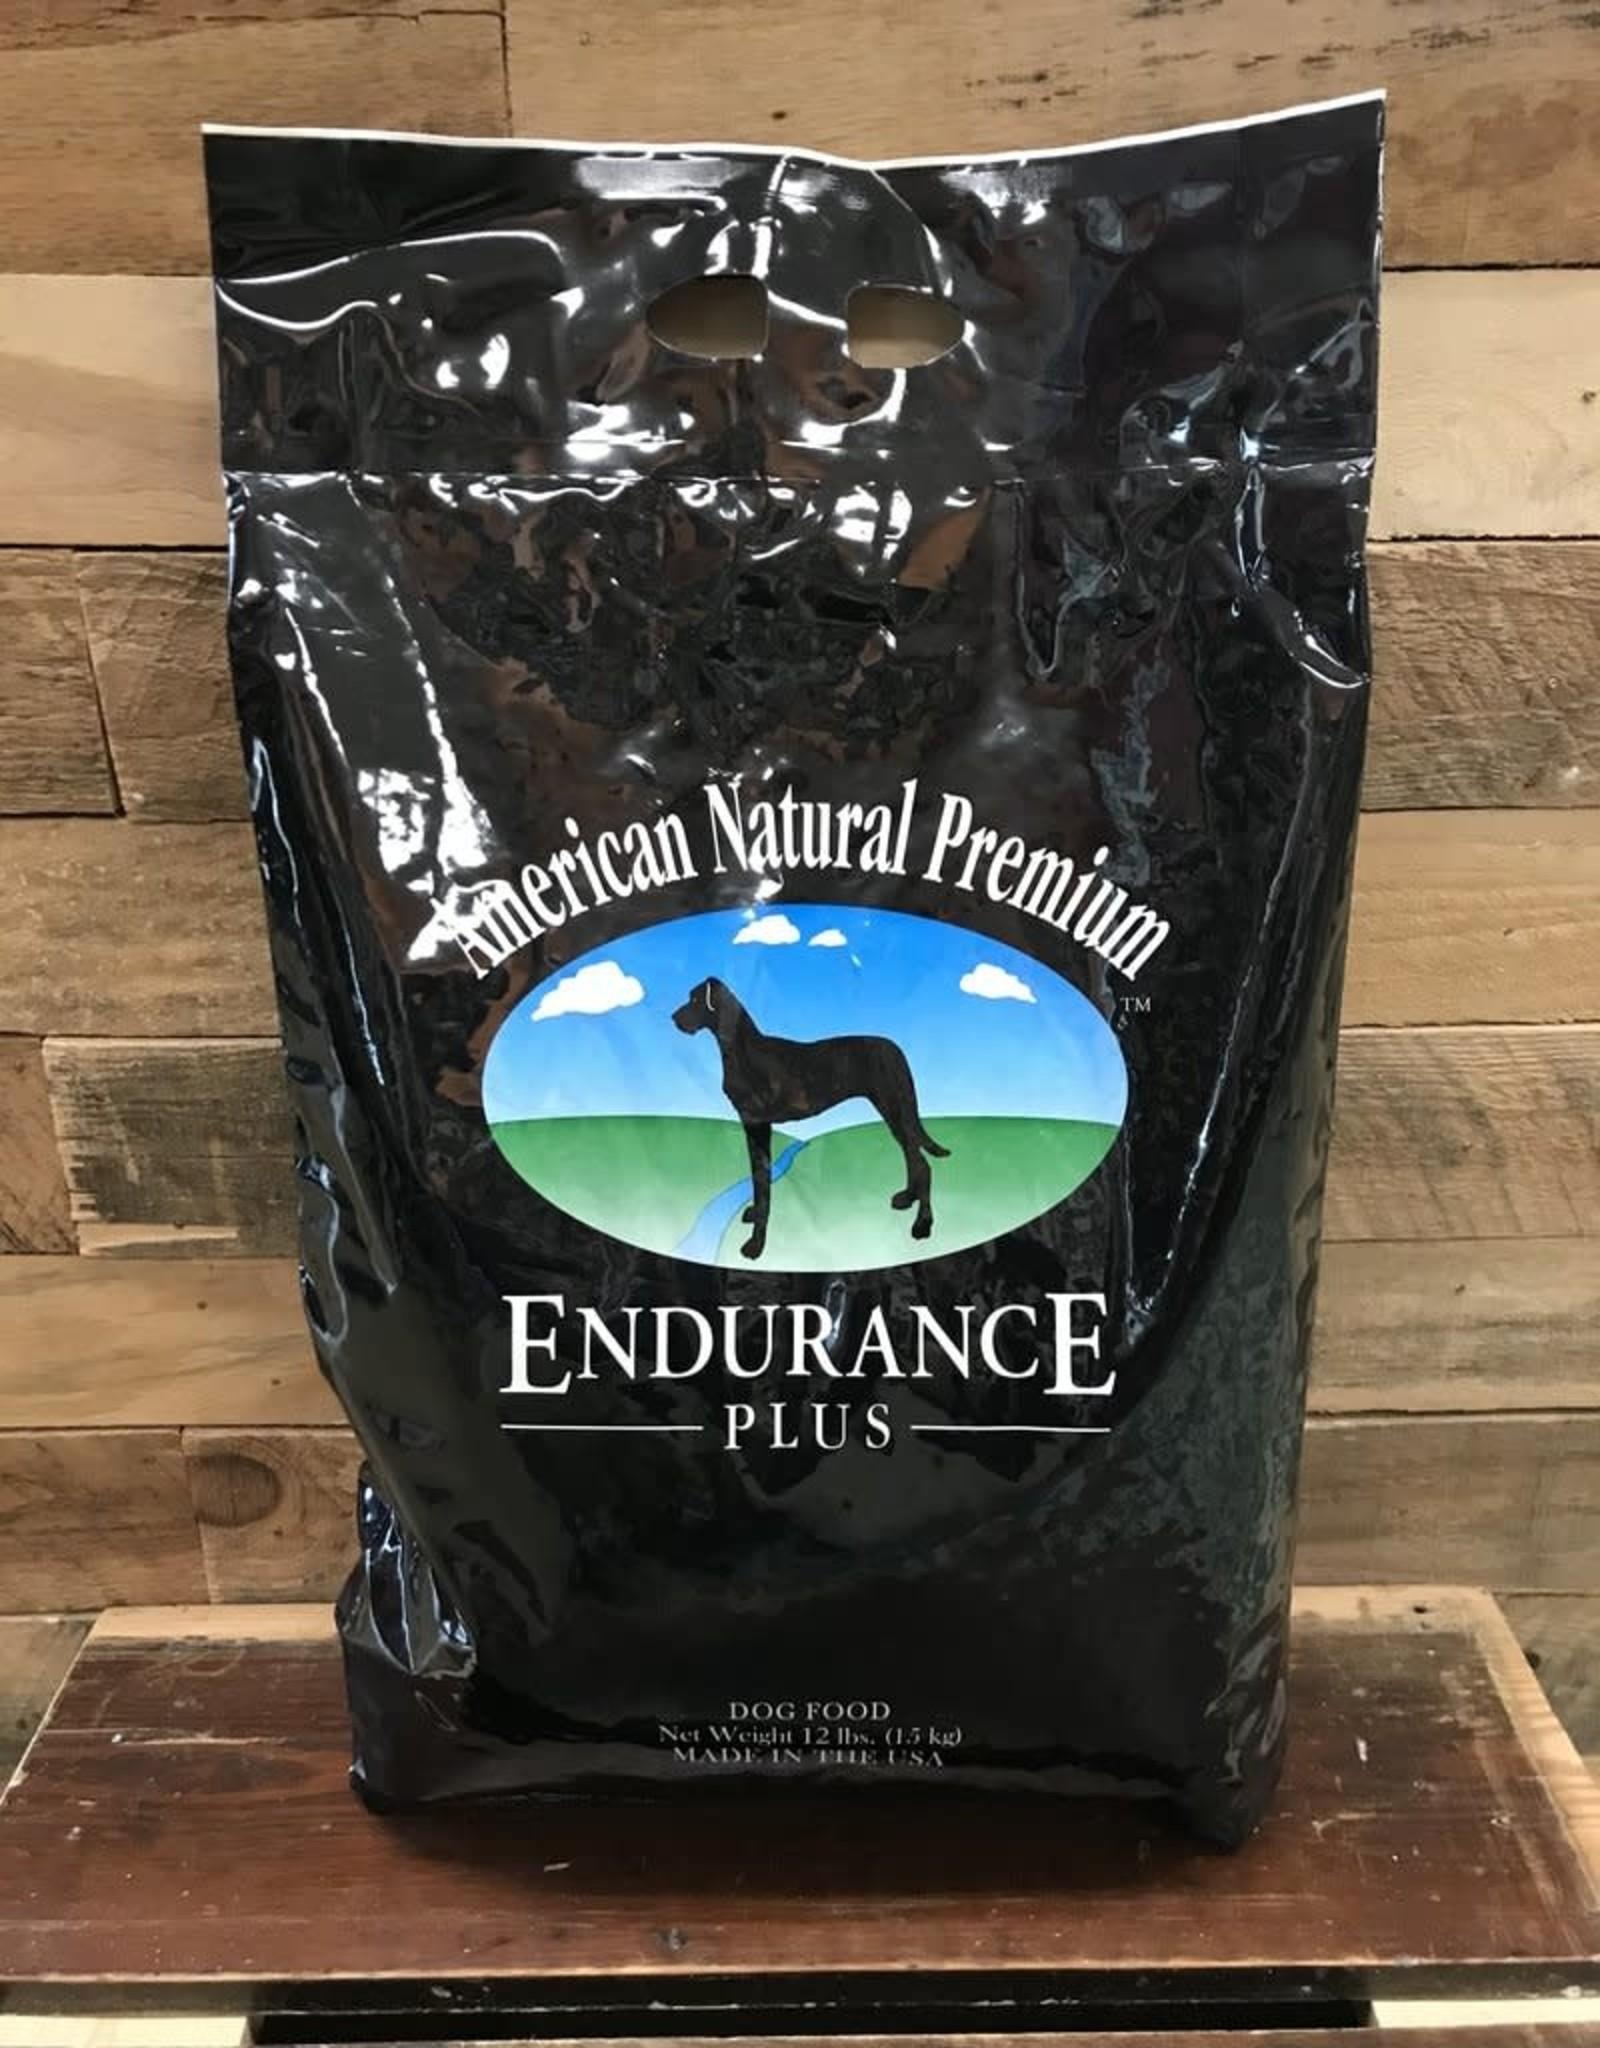 American Natural Premium American Natural Premium Endurance Plus - 2 sizes